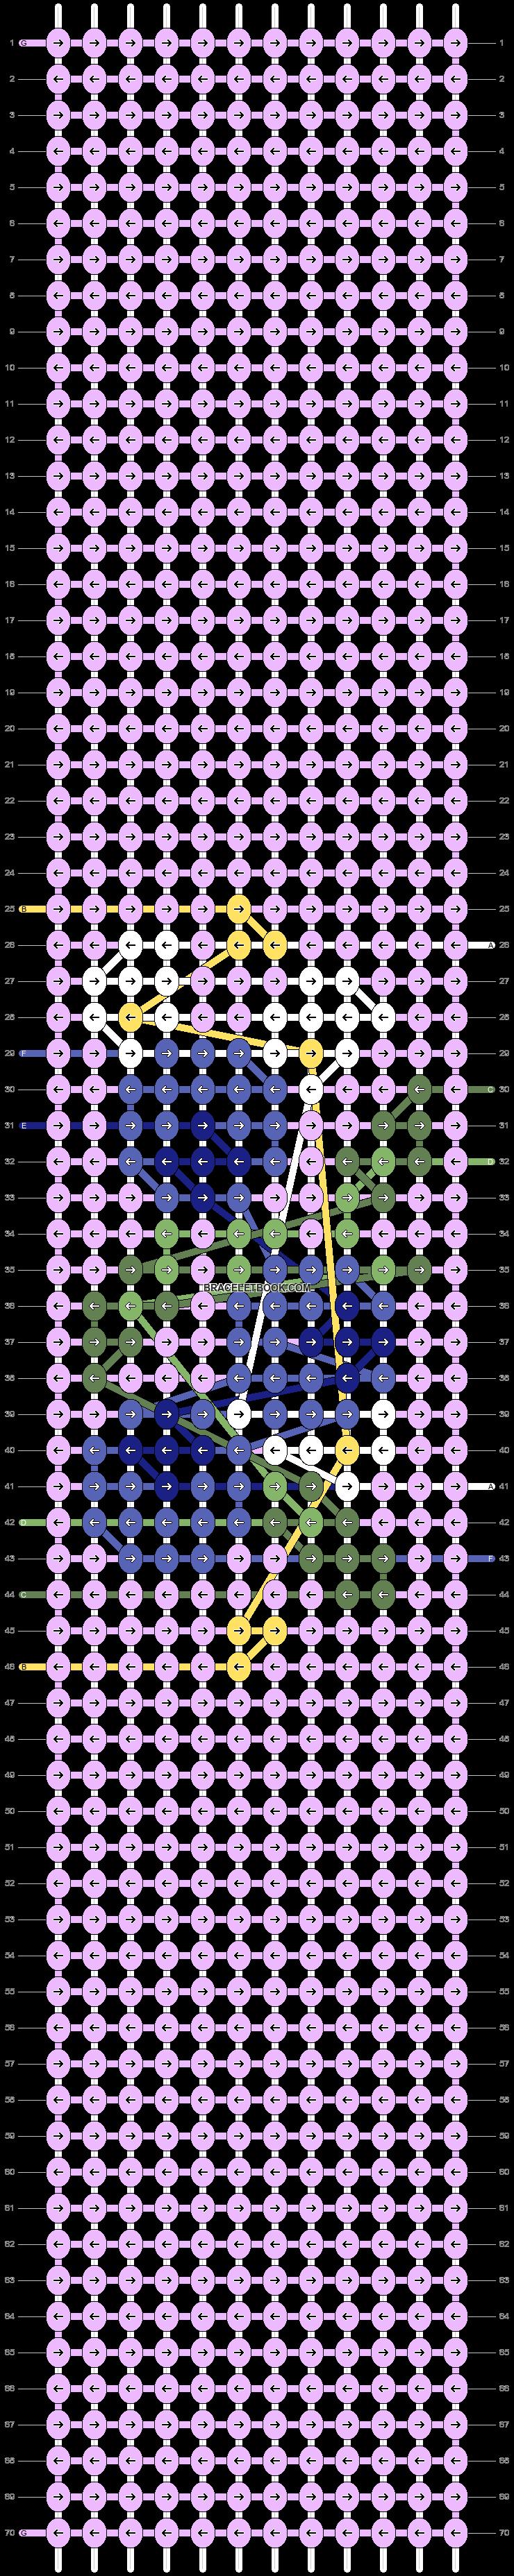 Alpha pattern #98051 variation #194385 pattern